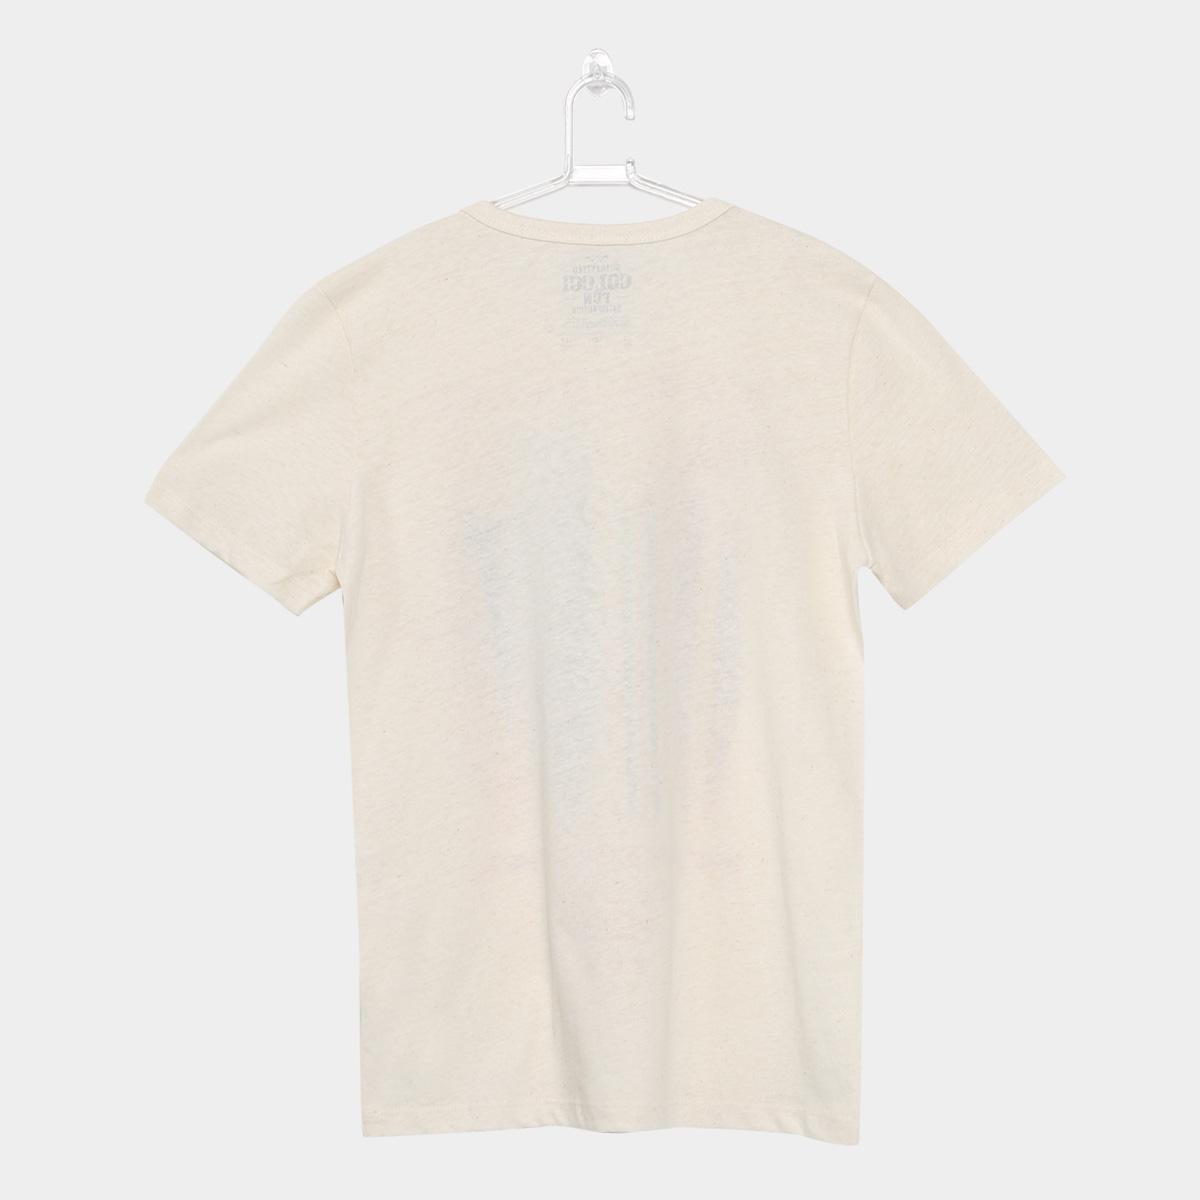 939976d63 camiseta infantil colcci fun paradise masculina. Carregando zoom.